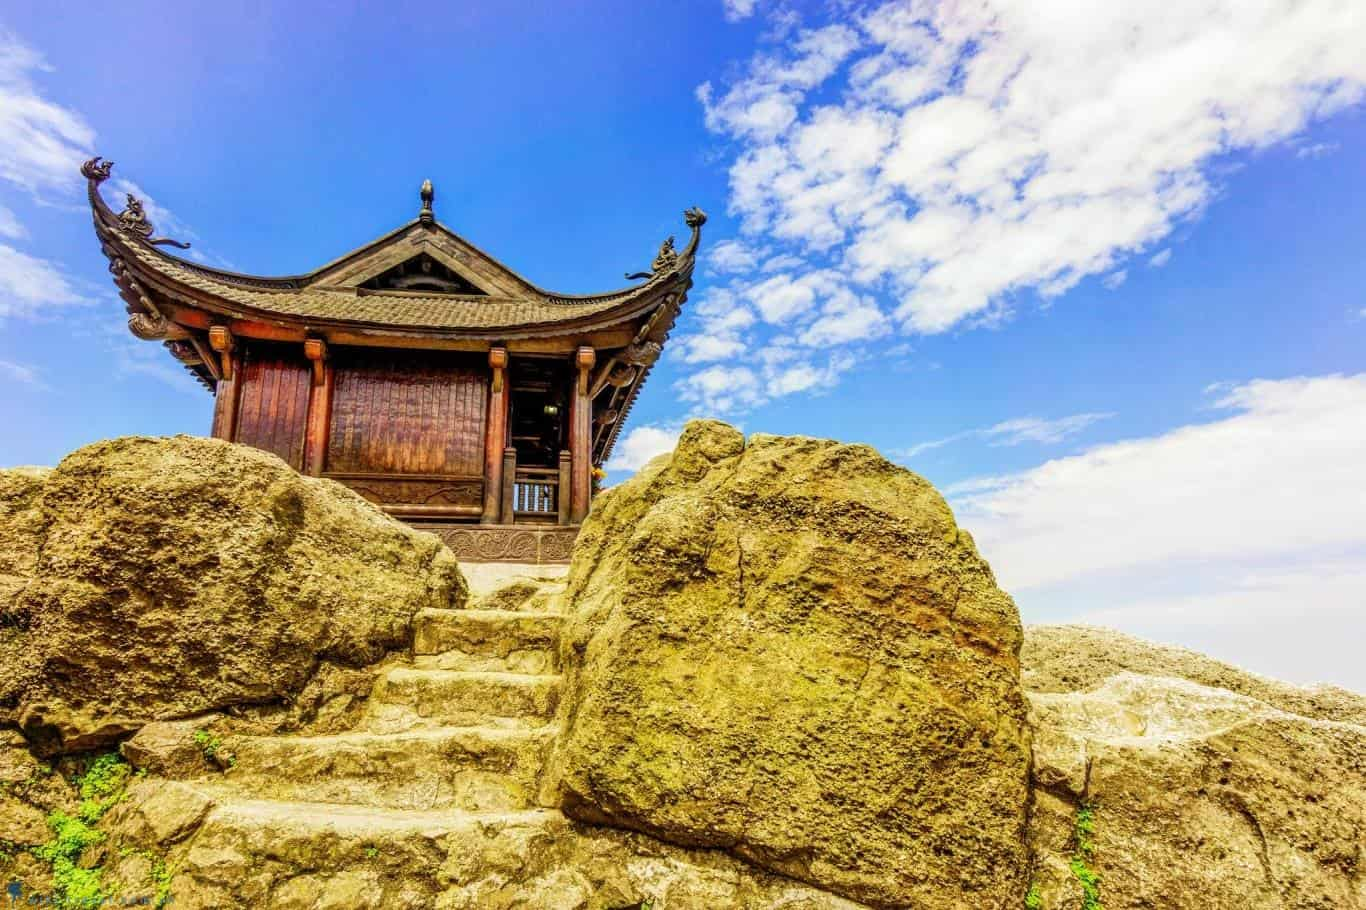 Yen Tu Festival Pagoda